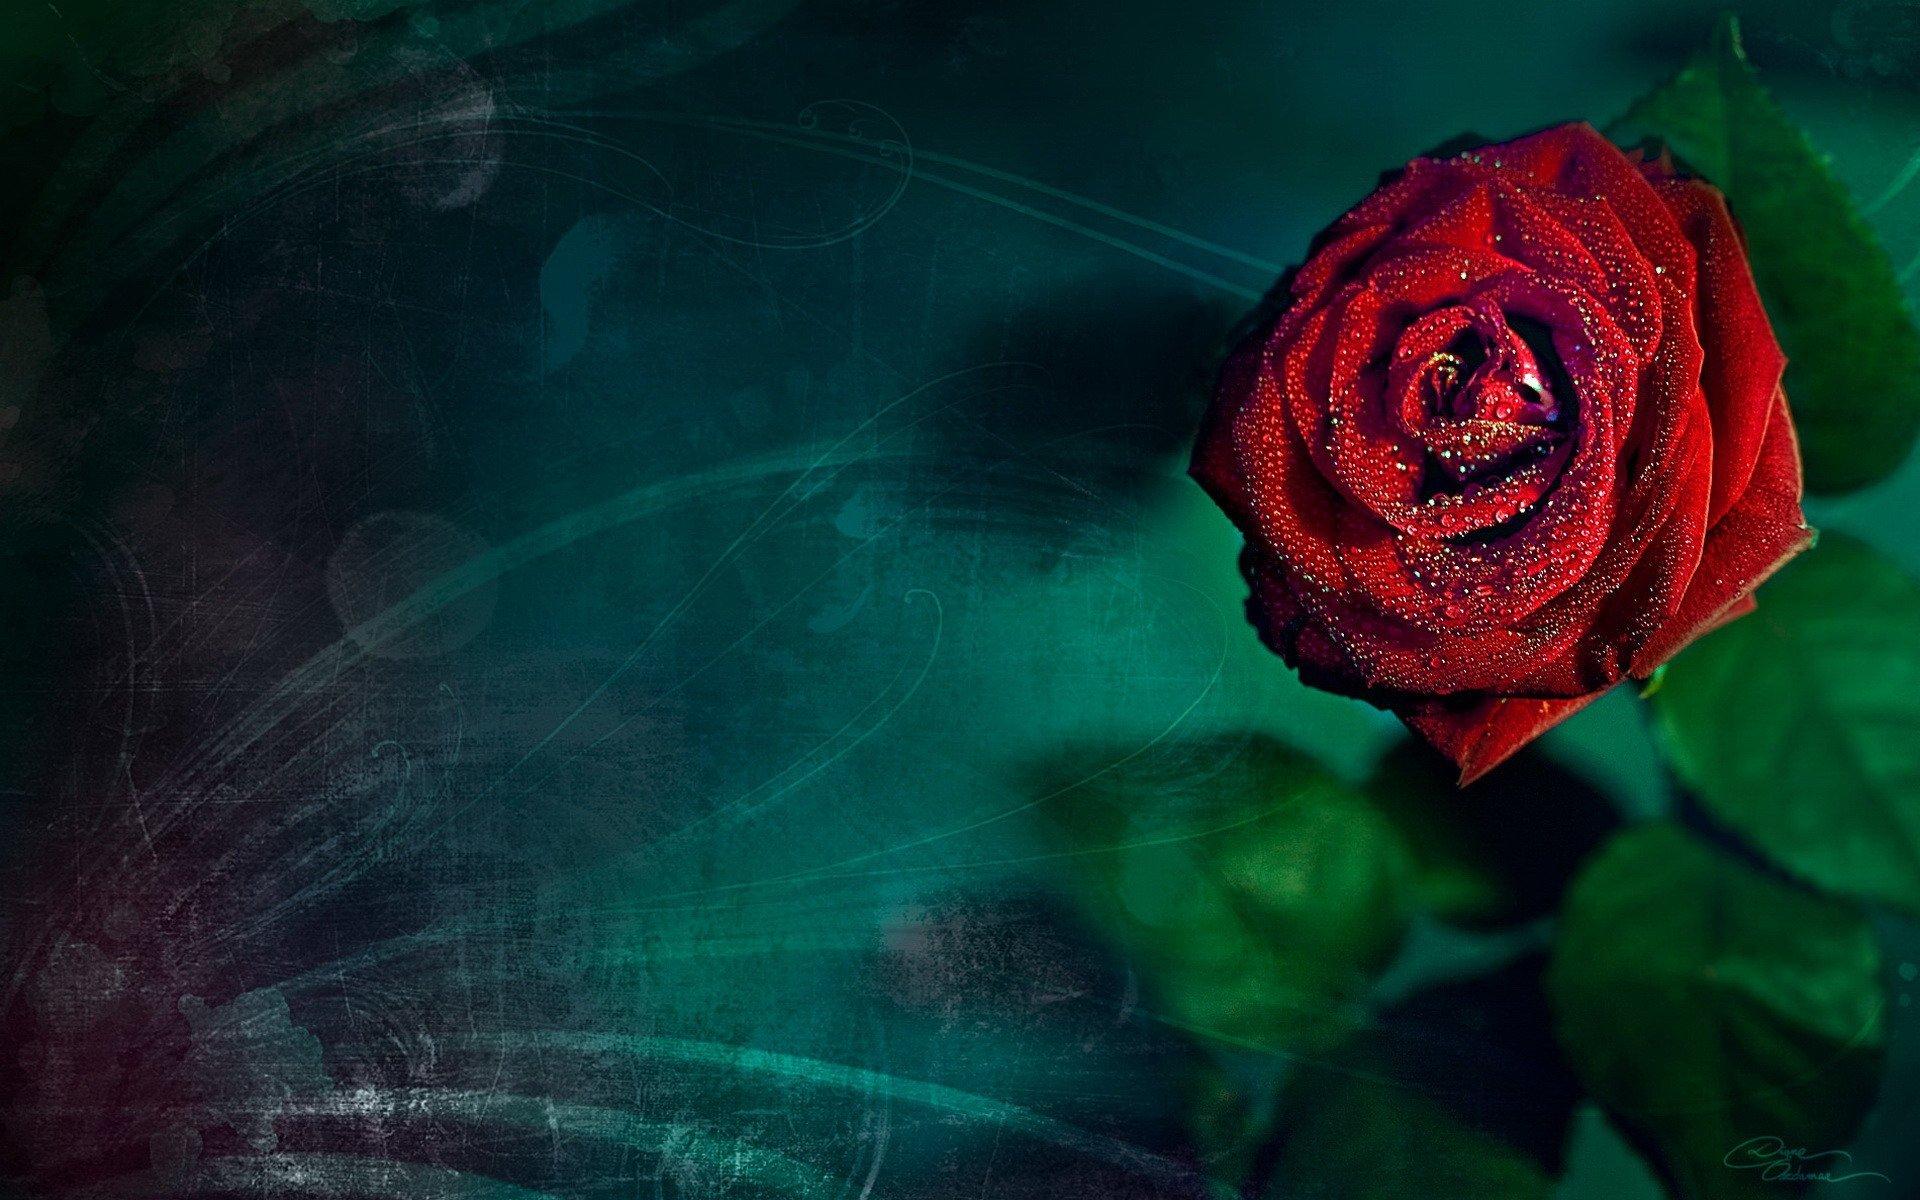 графика космос цветы роза graphics space flowers rose  № 927168 бесплатно